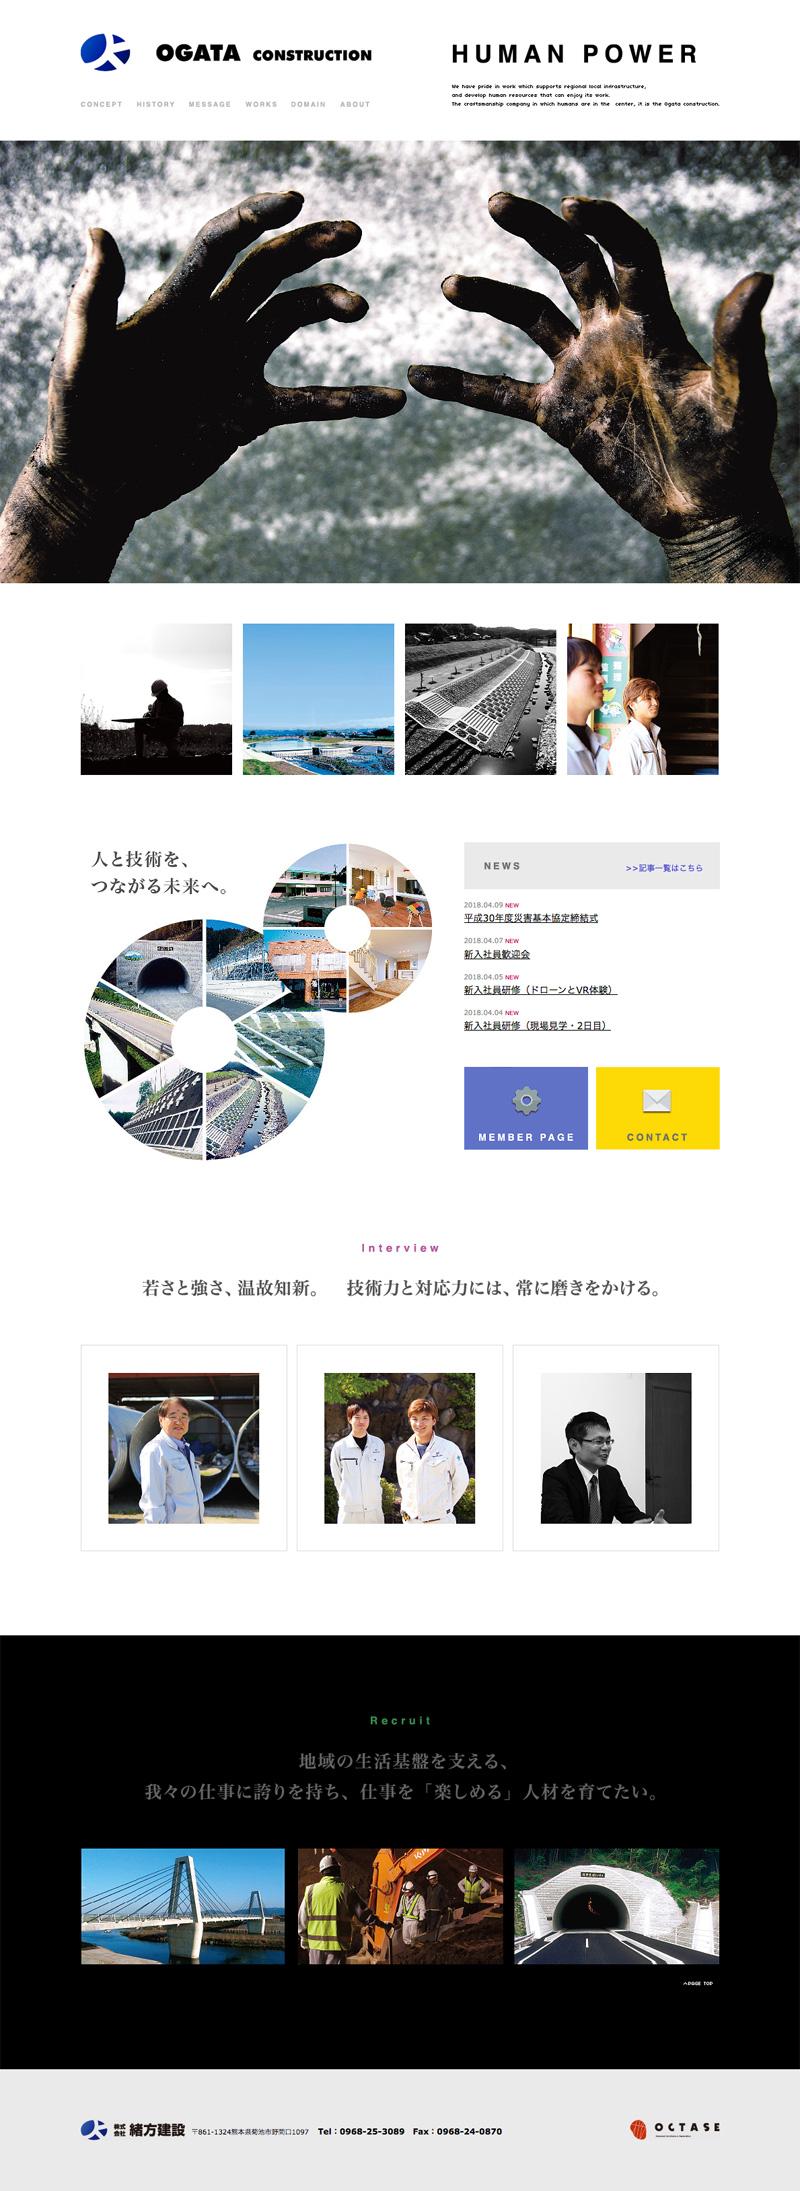 web_ogata.jpg